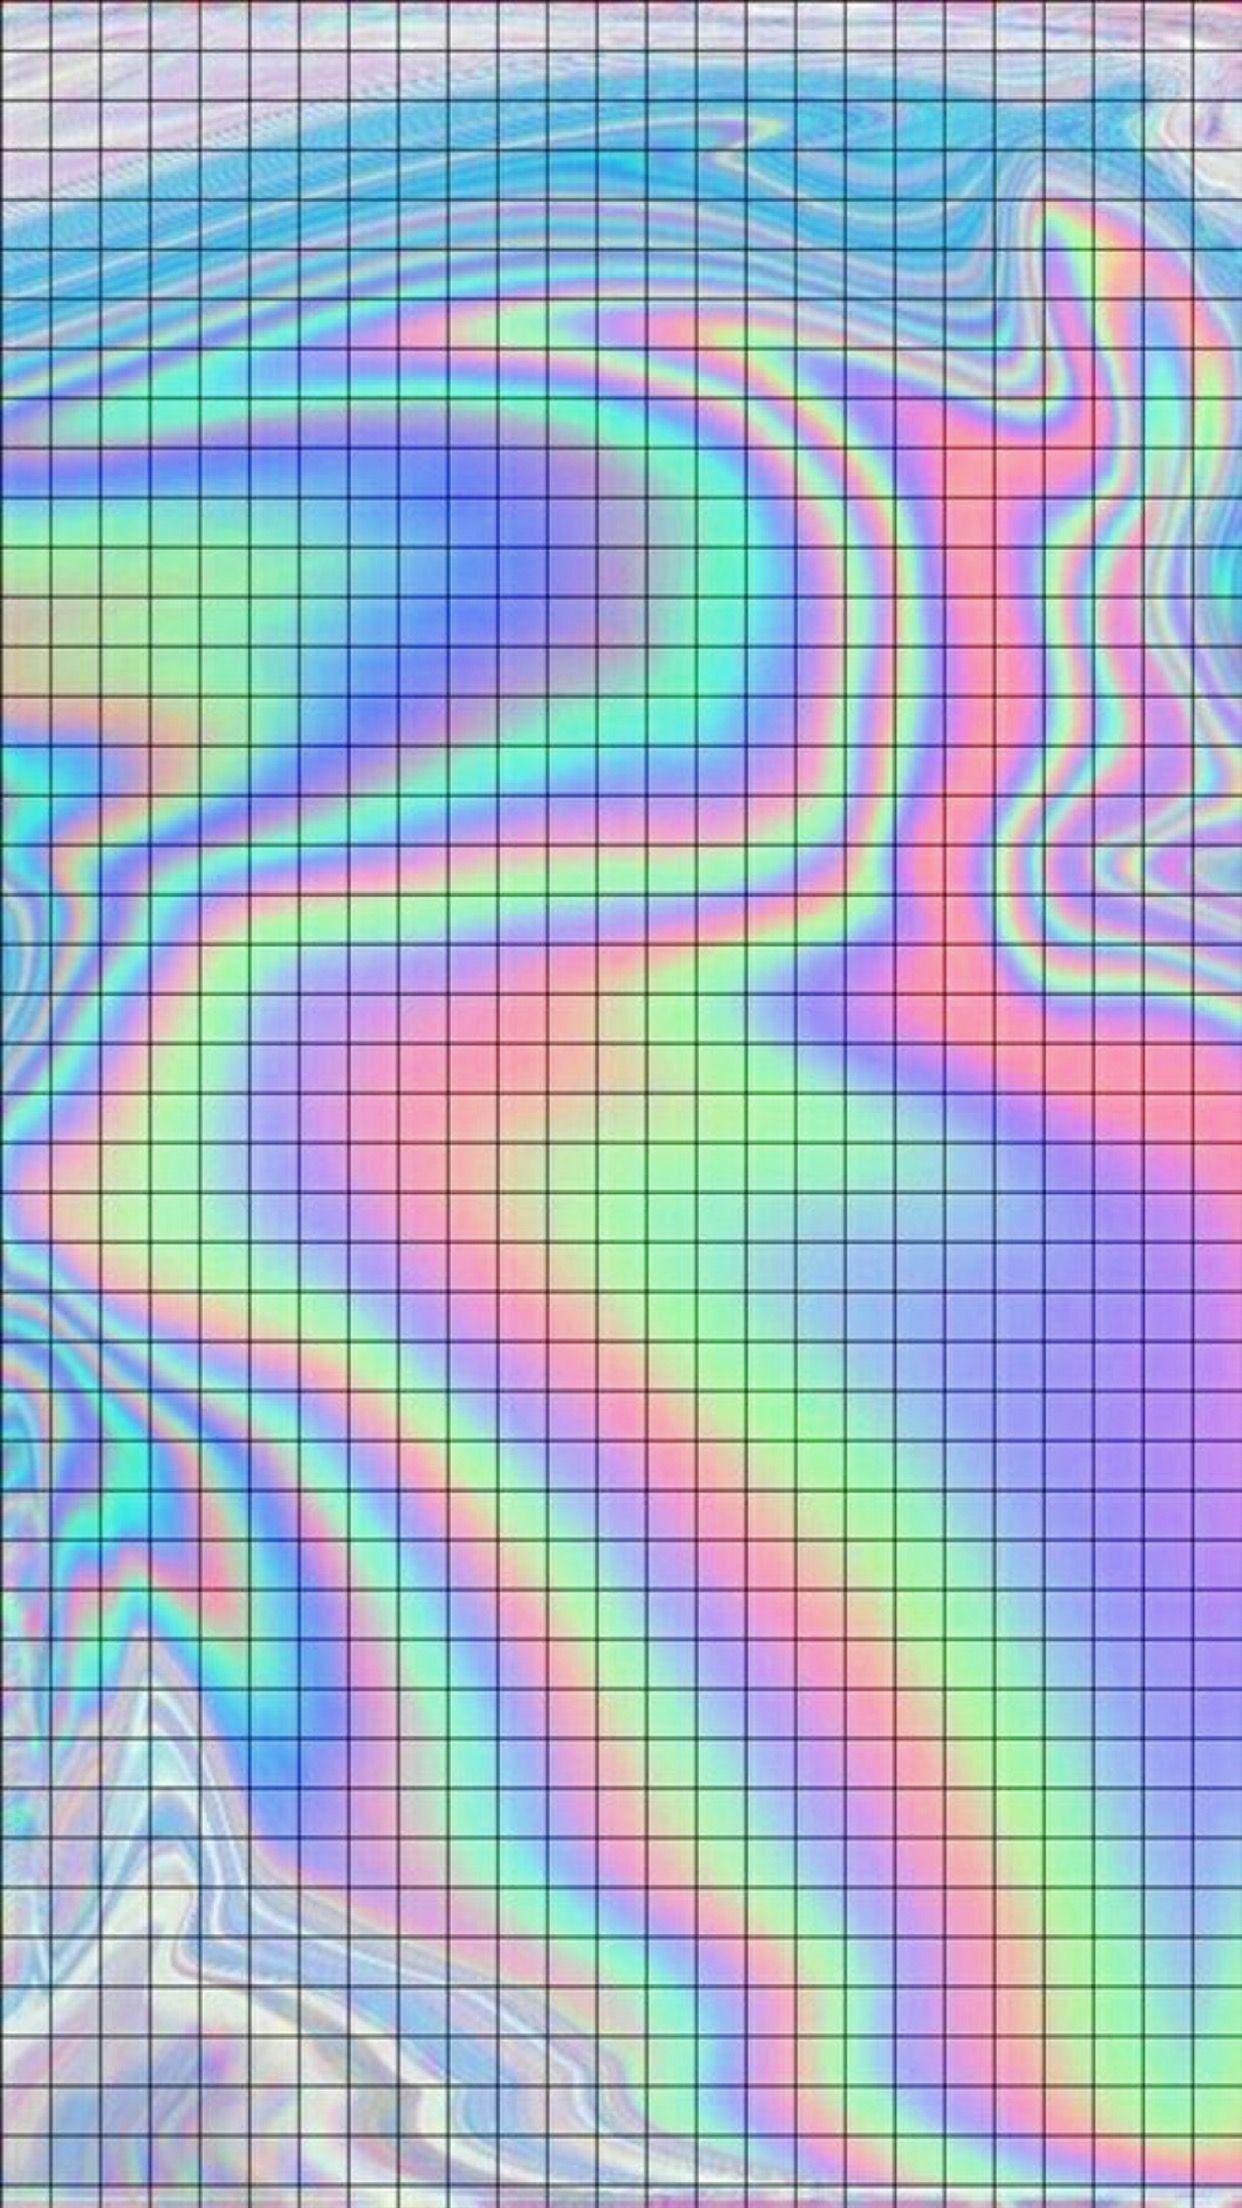 Hologram Wallpapers Top Free Hologram Backgrounds